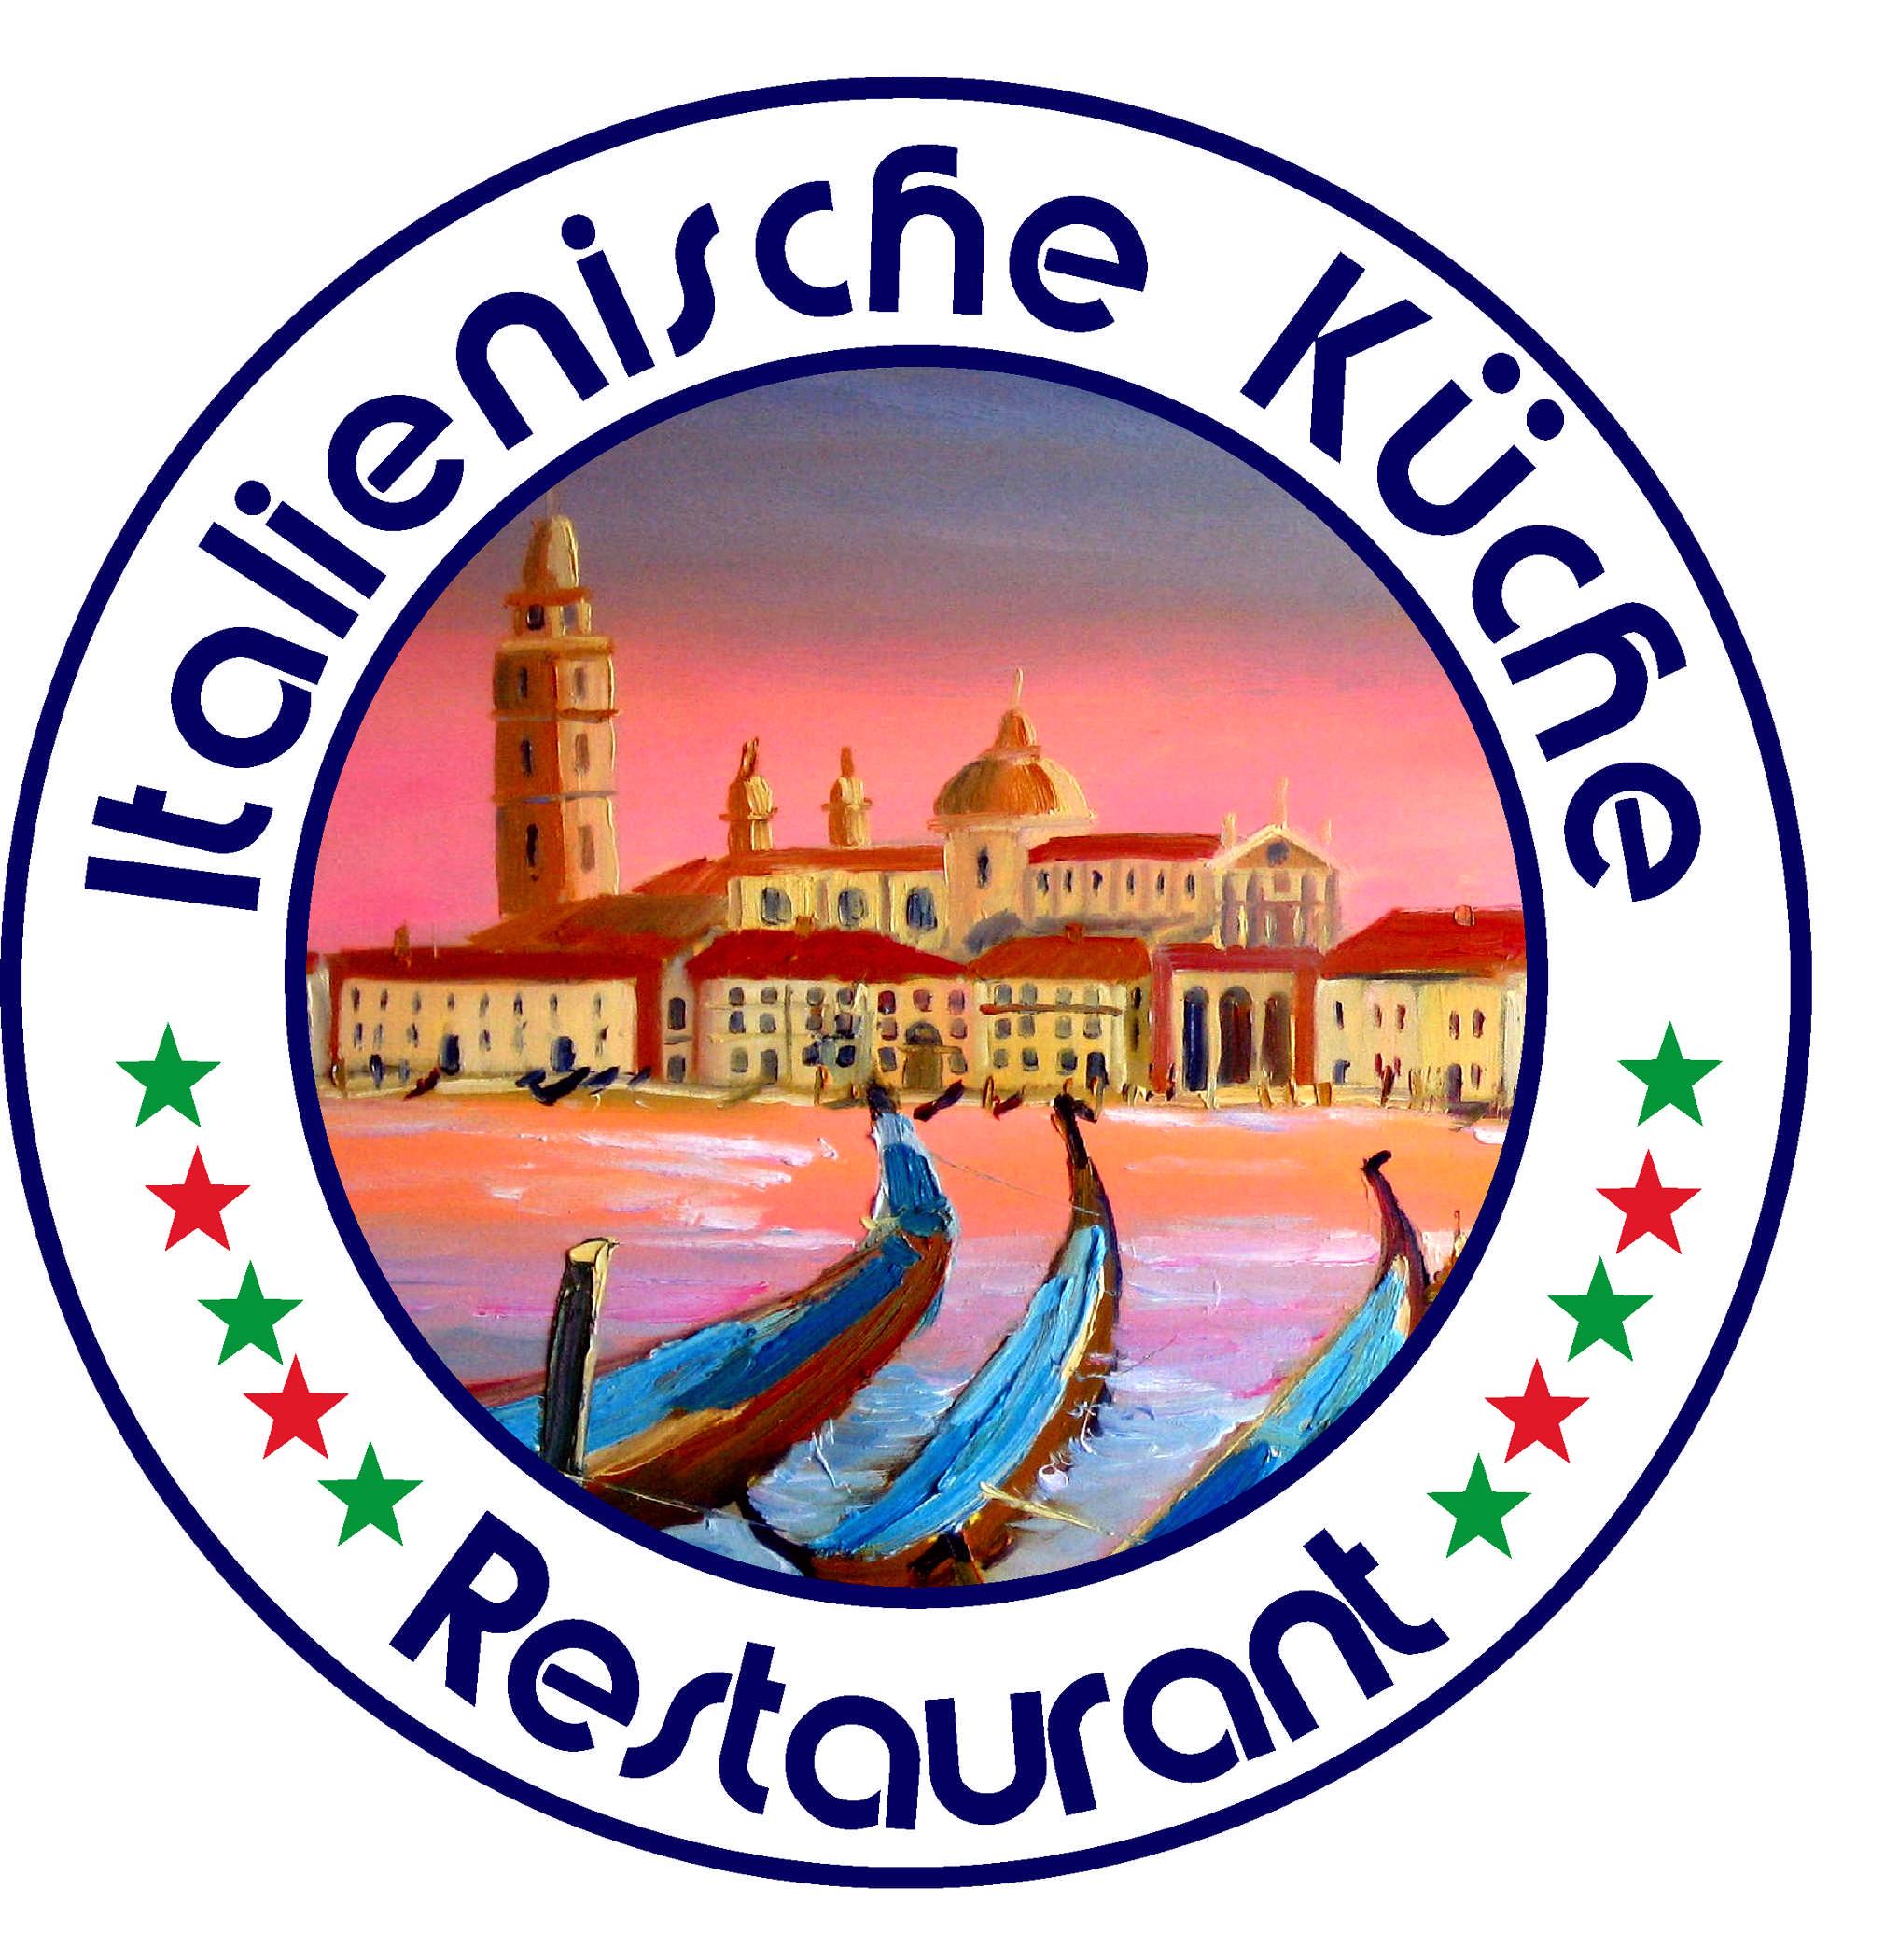 Logo italienische Küche Restaurant Venezia Painting Renoir pink ...